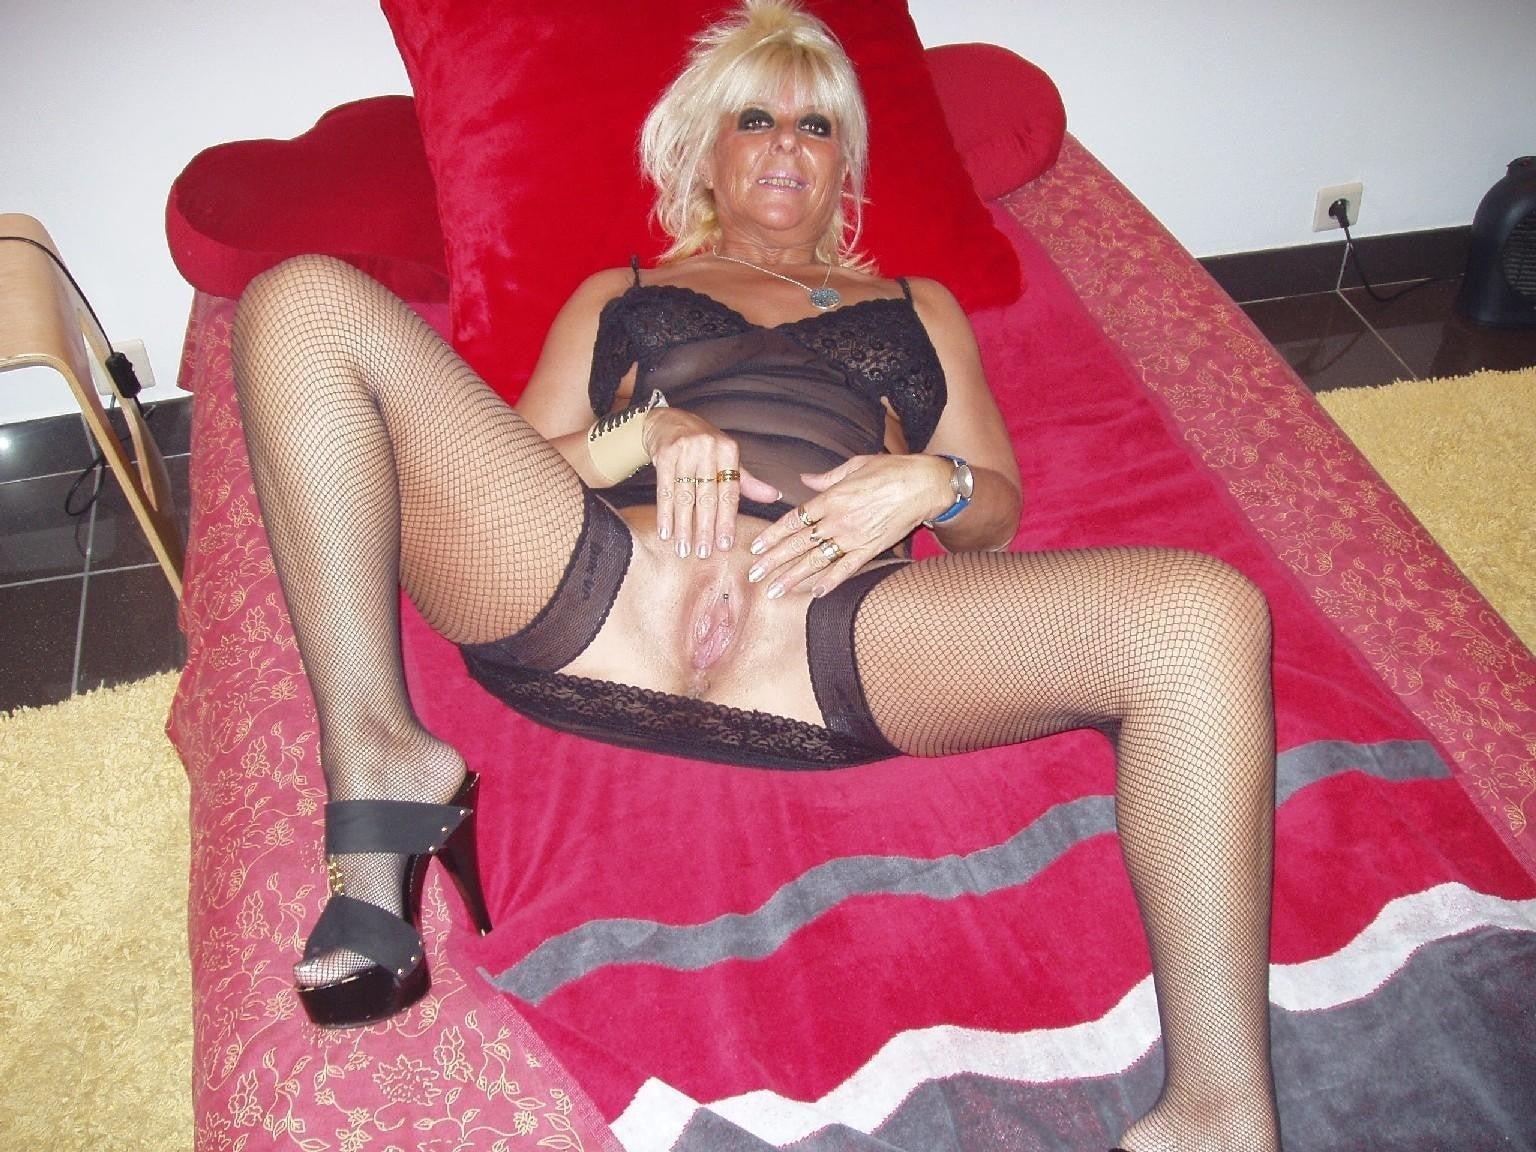 AnasthesiaLove from Bridgend,United Kingdom